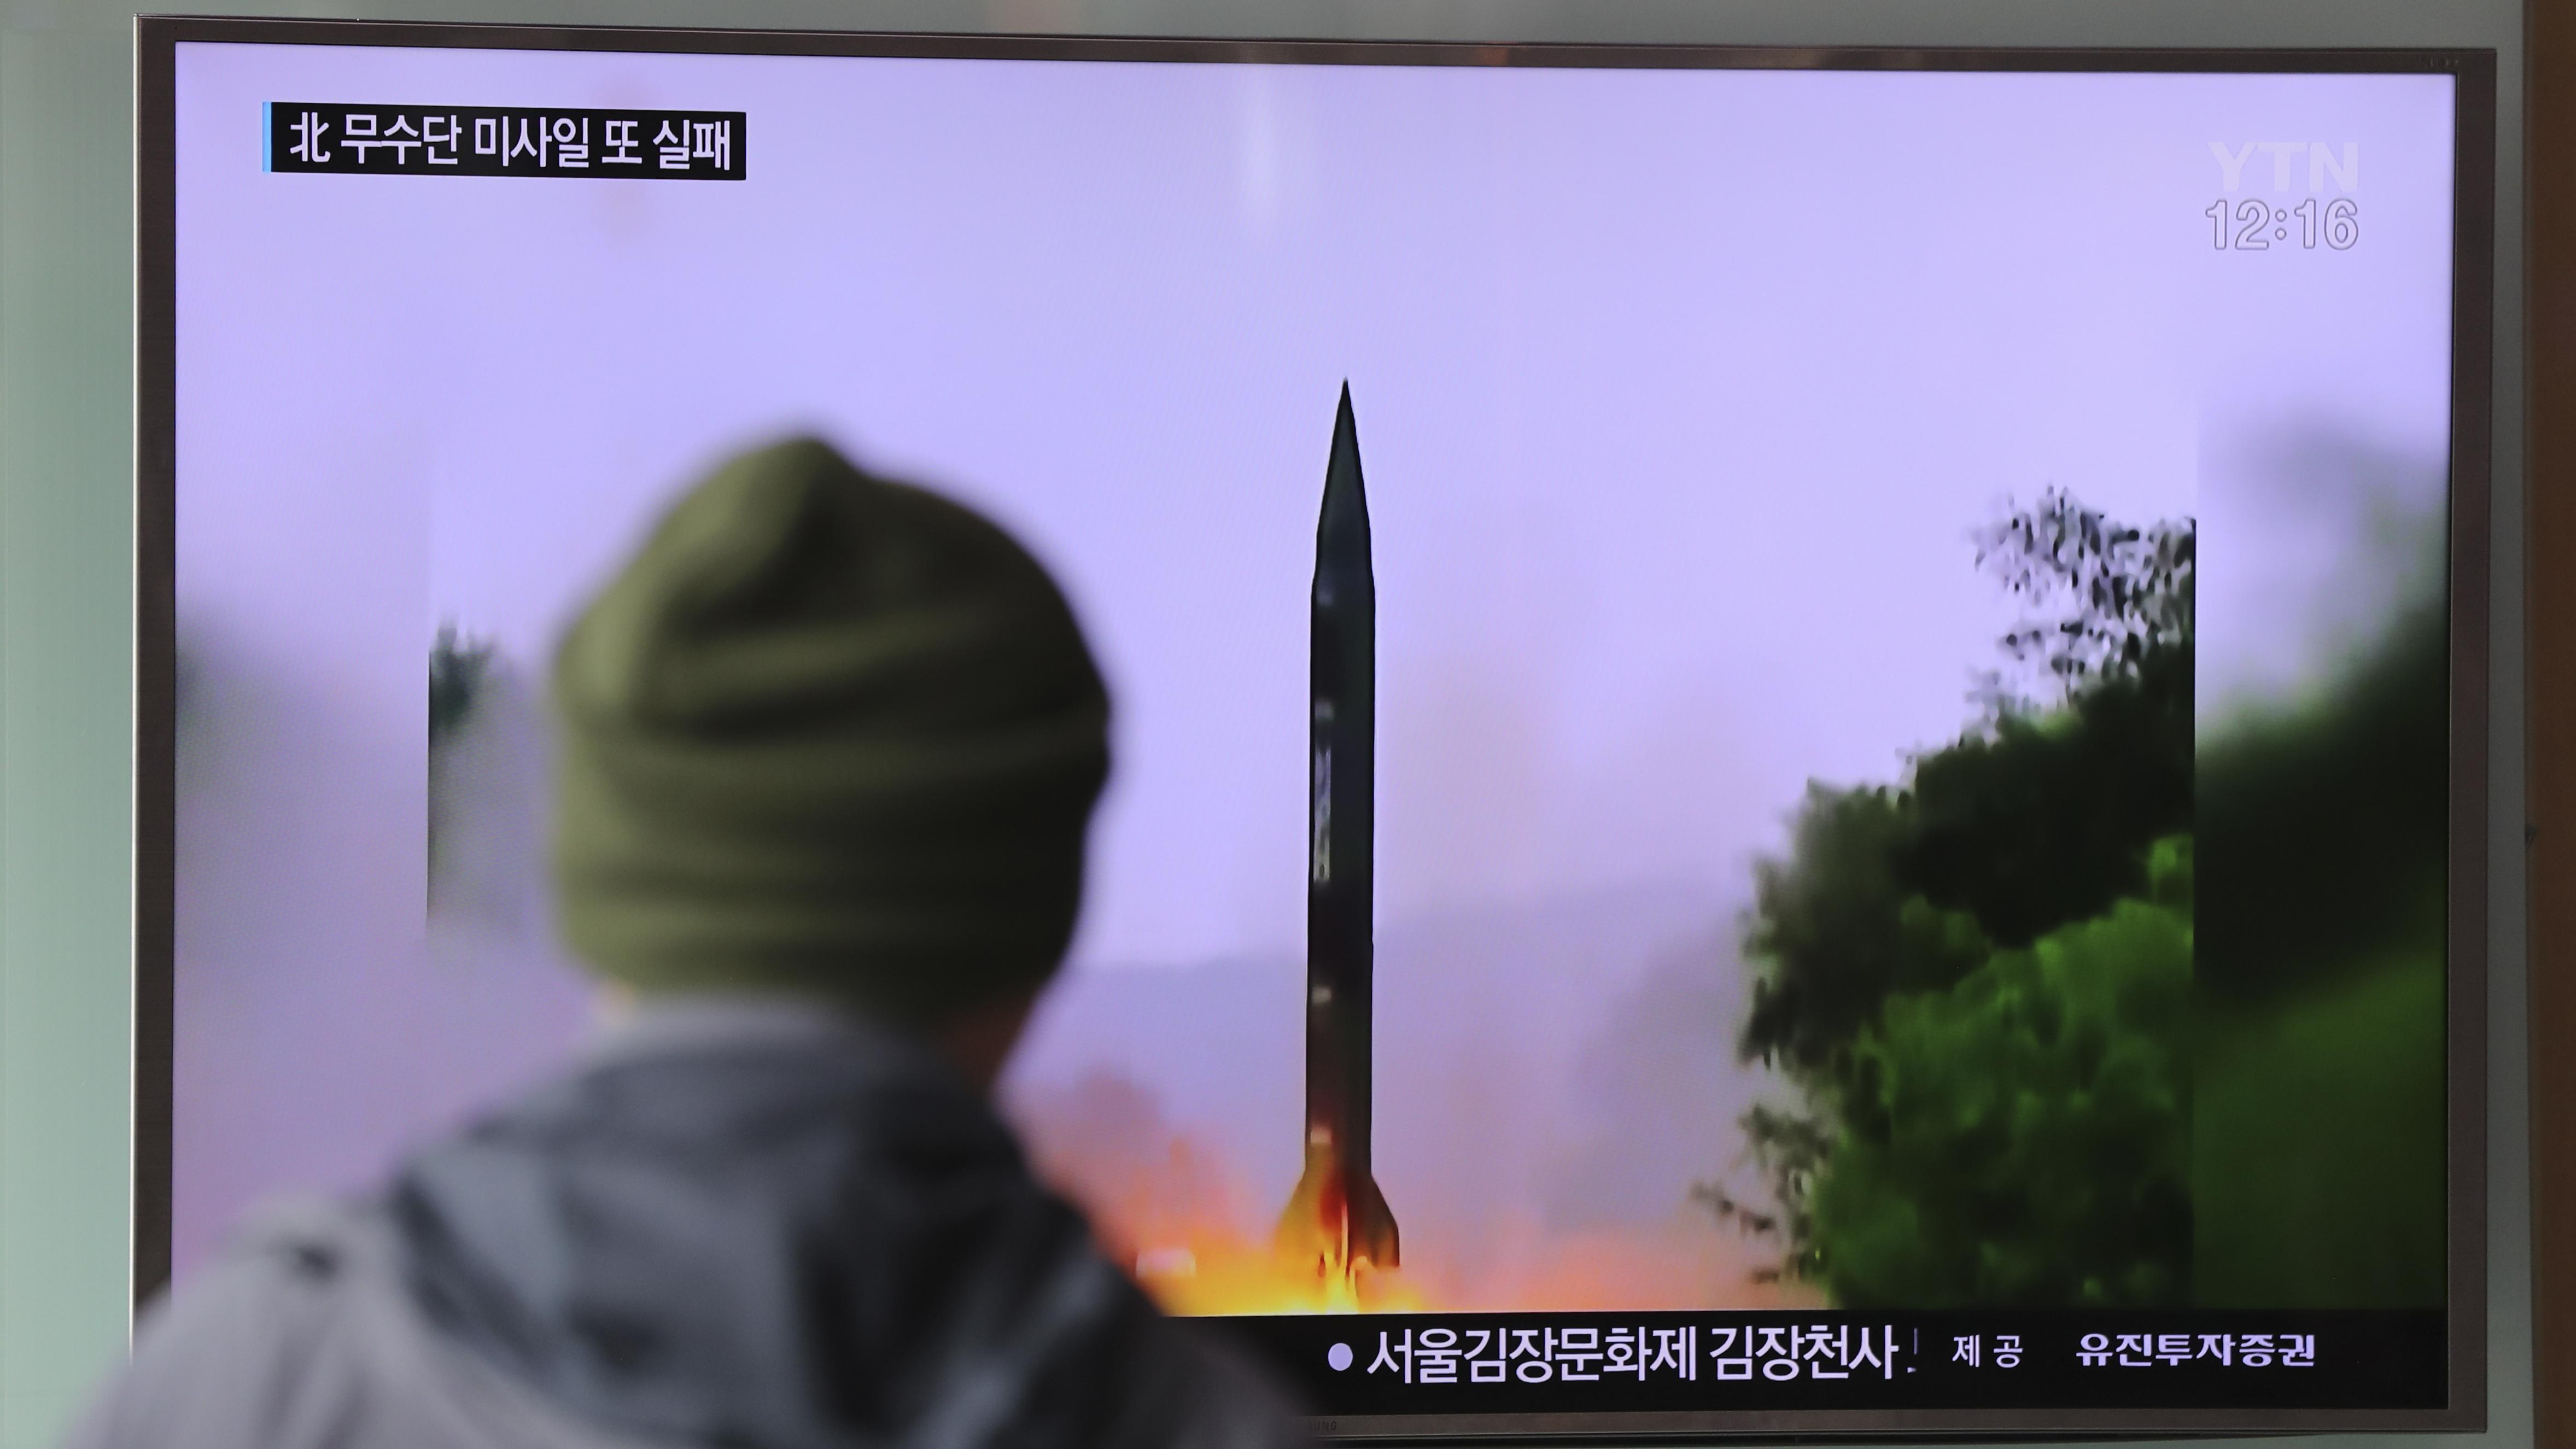 https://media.npr.org/assets/img/2016/10/25/n.-korea-missile-10-25-16_wide-a0e32c830d8f31cccf9621c0e0d04e375c9b2e98.jpg